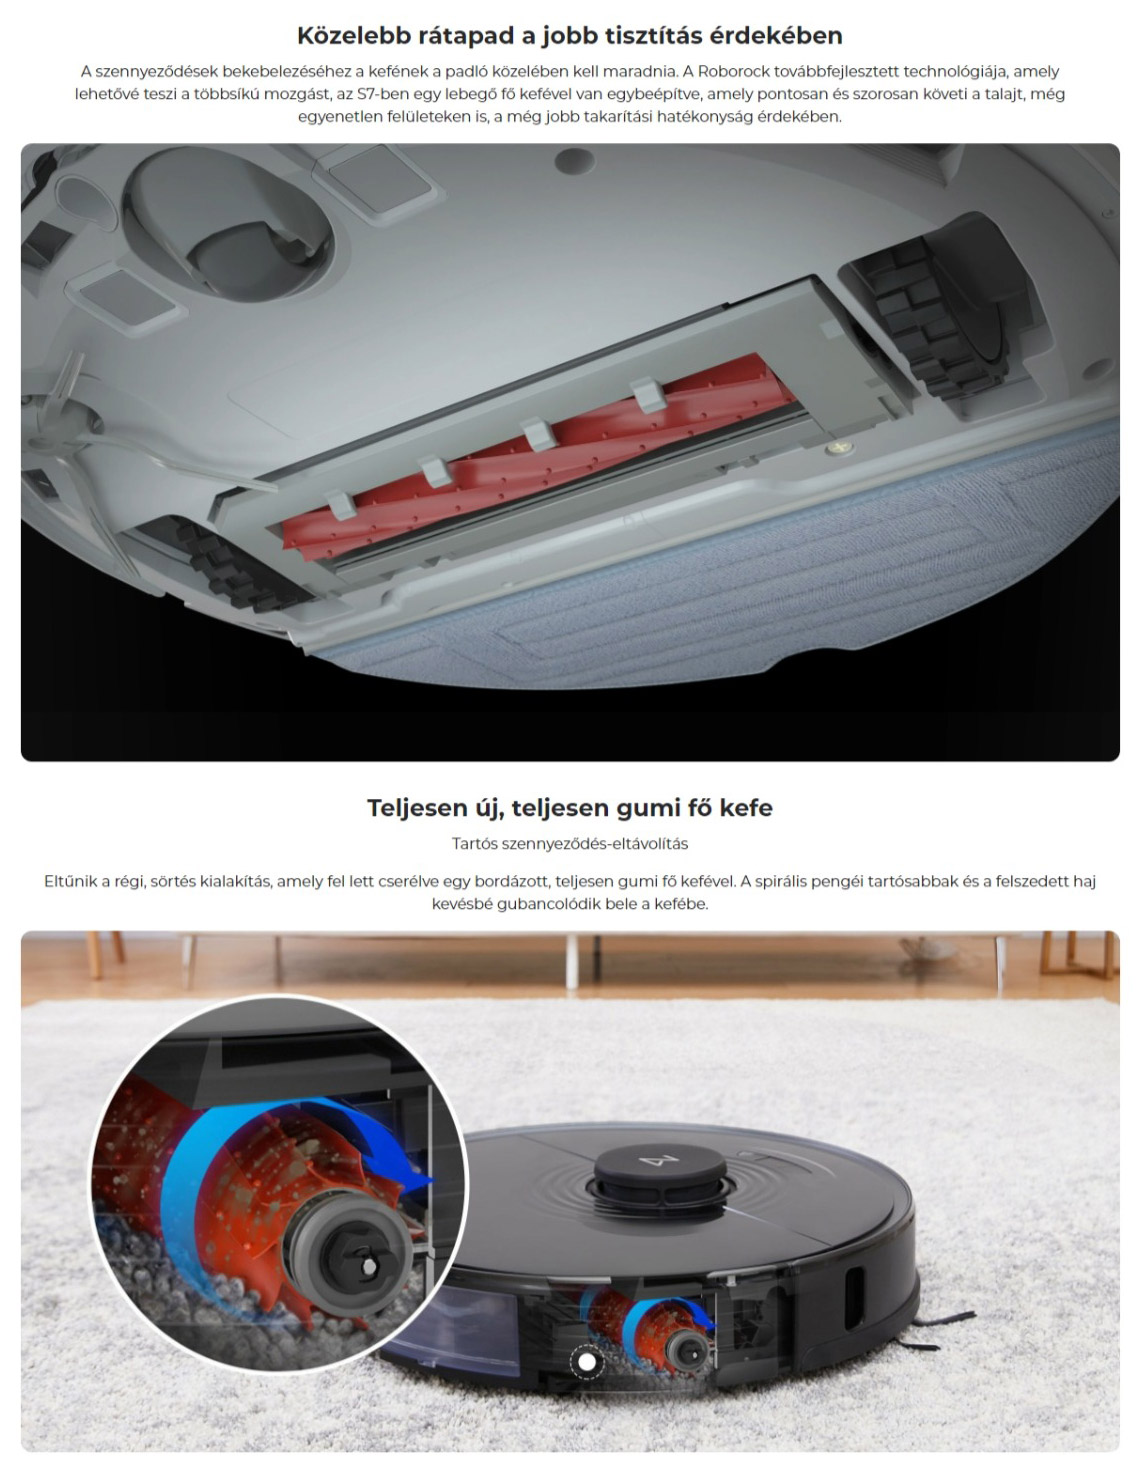 Xiaomi Roborock S7 Robotic Vacuum Cleaner porszívó